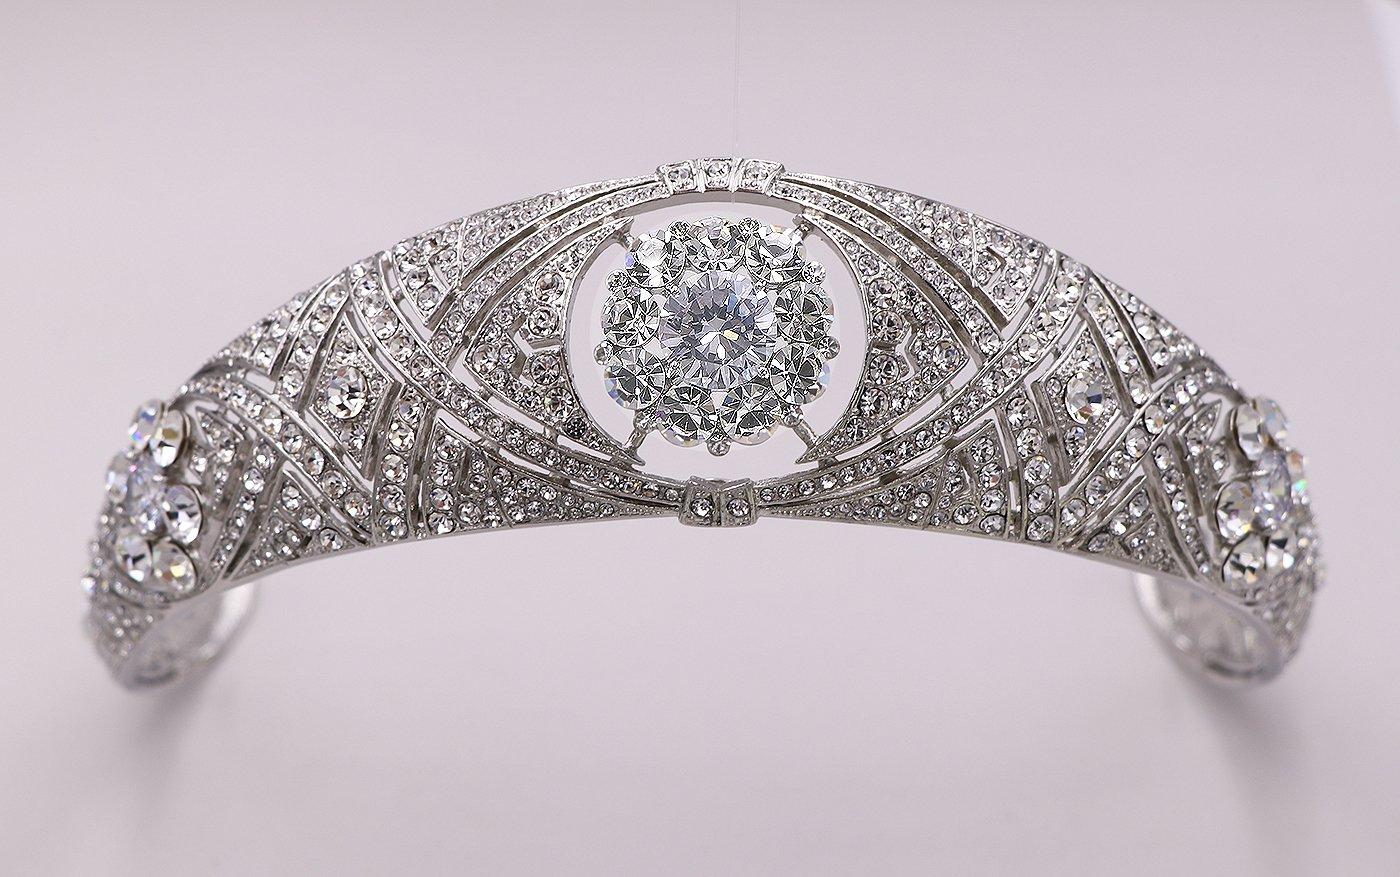 Amazon Com Meghan Markle Wedding Cubic Zirconia And Rhinestone Tiara Headpiece Handmade